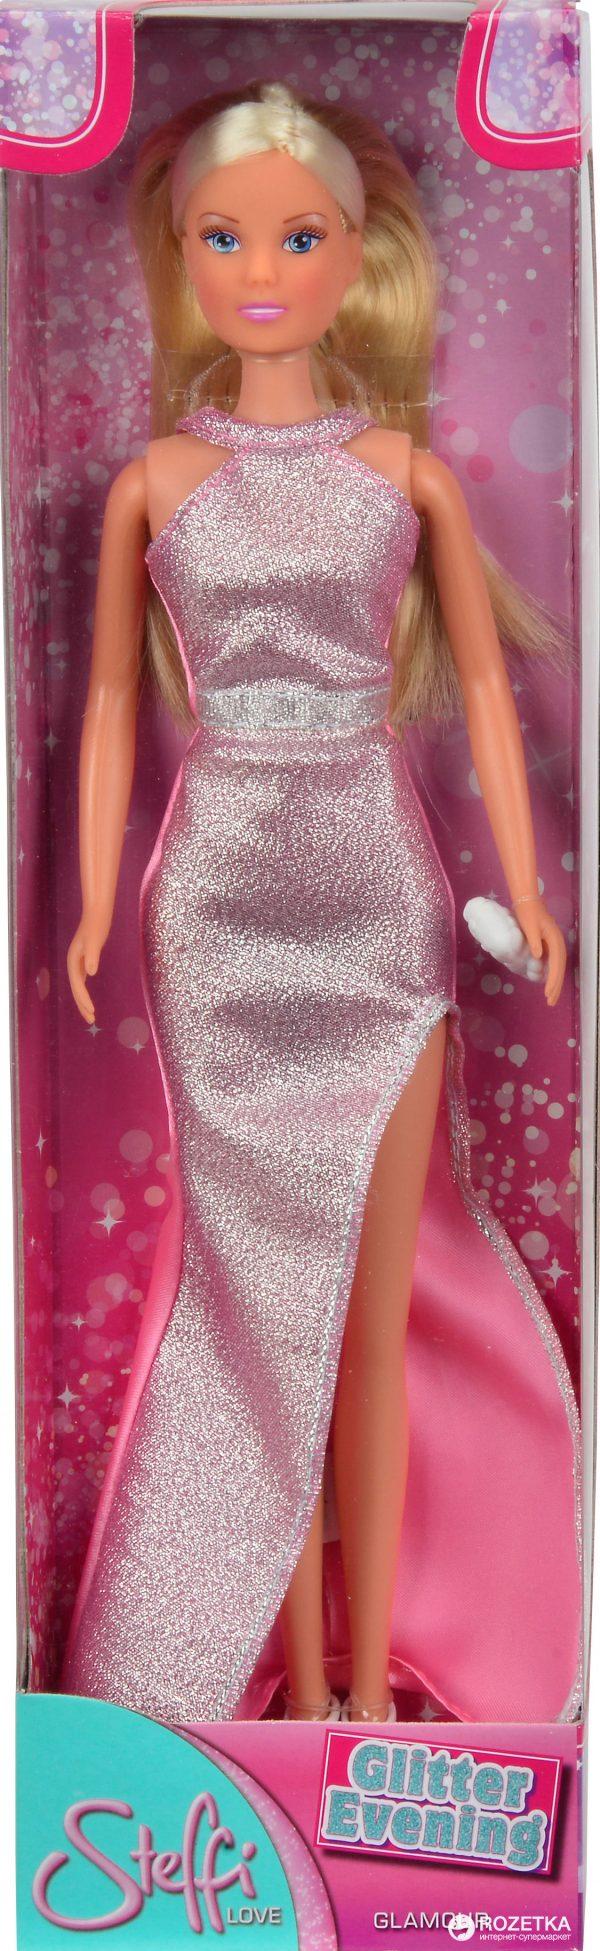 Кукла Simba Штеффи «Вечерний стиль» с сумочкой